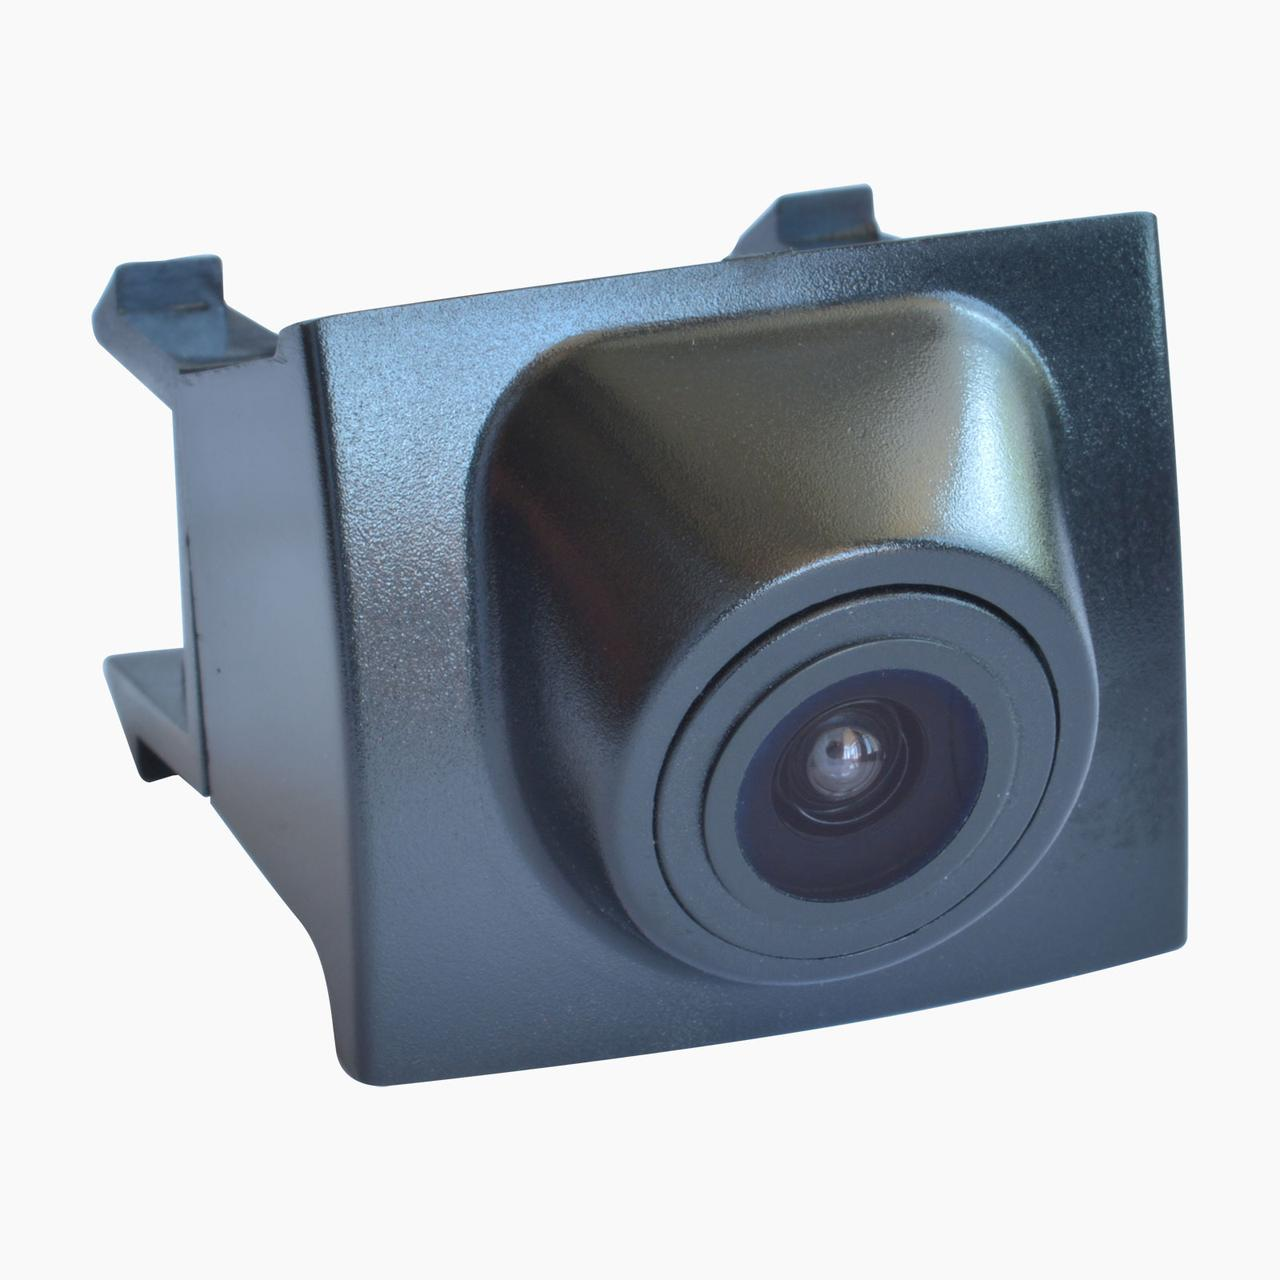 Камера переднего вида Prime-X С8069. Ford Mondeo 2014